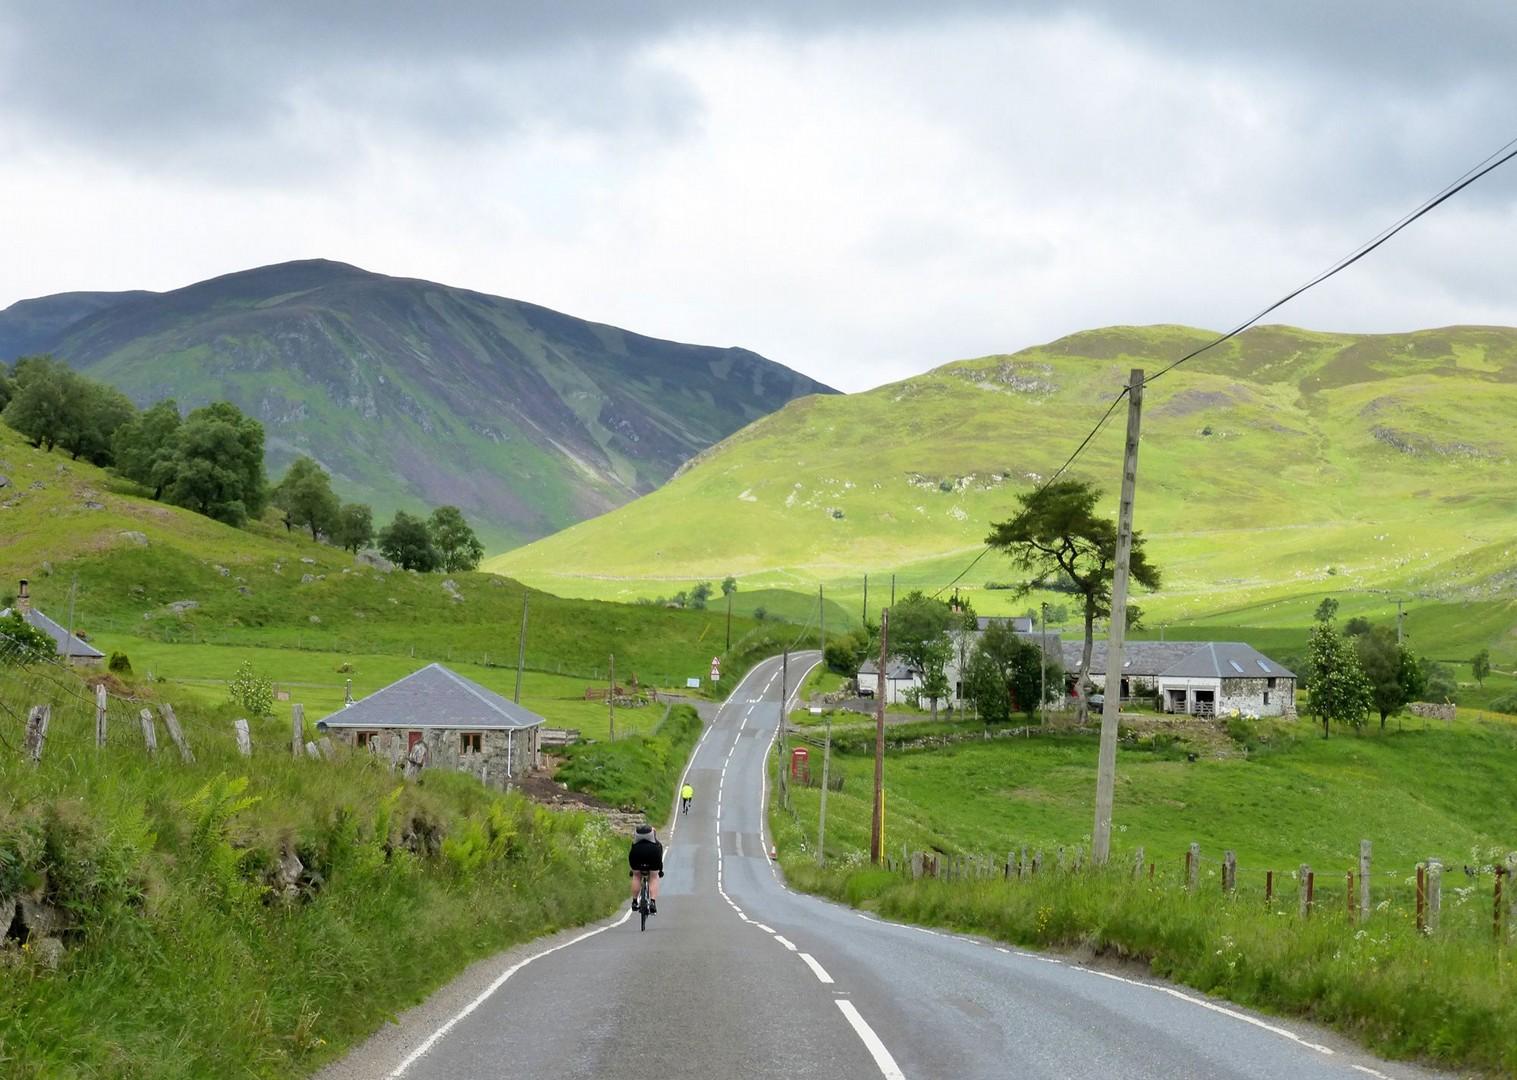 cycling-holiday-sustrans-lands-end-to-john-ogroats.jpg - UK - Land's End to John O'Groats Explorer (22 days) - Guided Cycling Holiday - Road Cycling